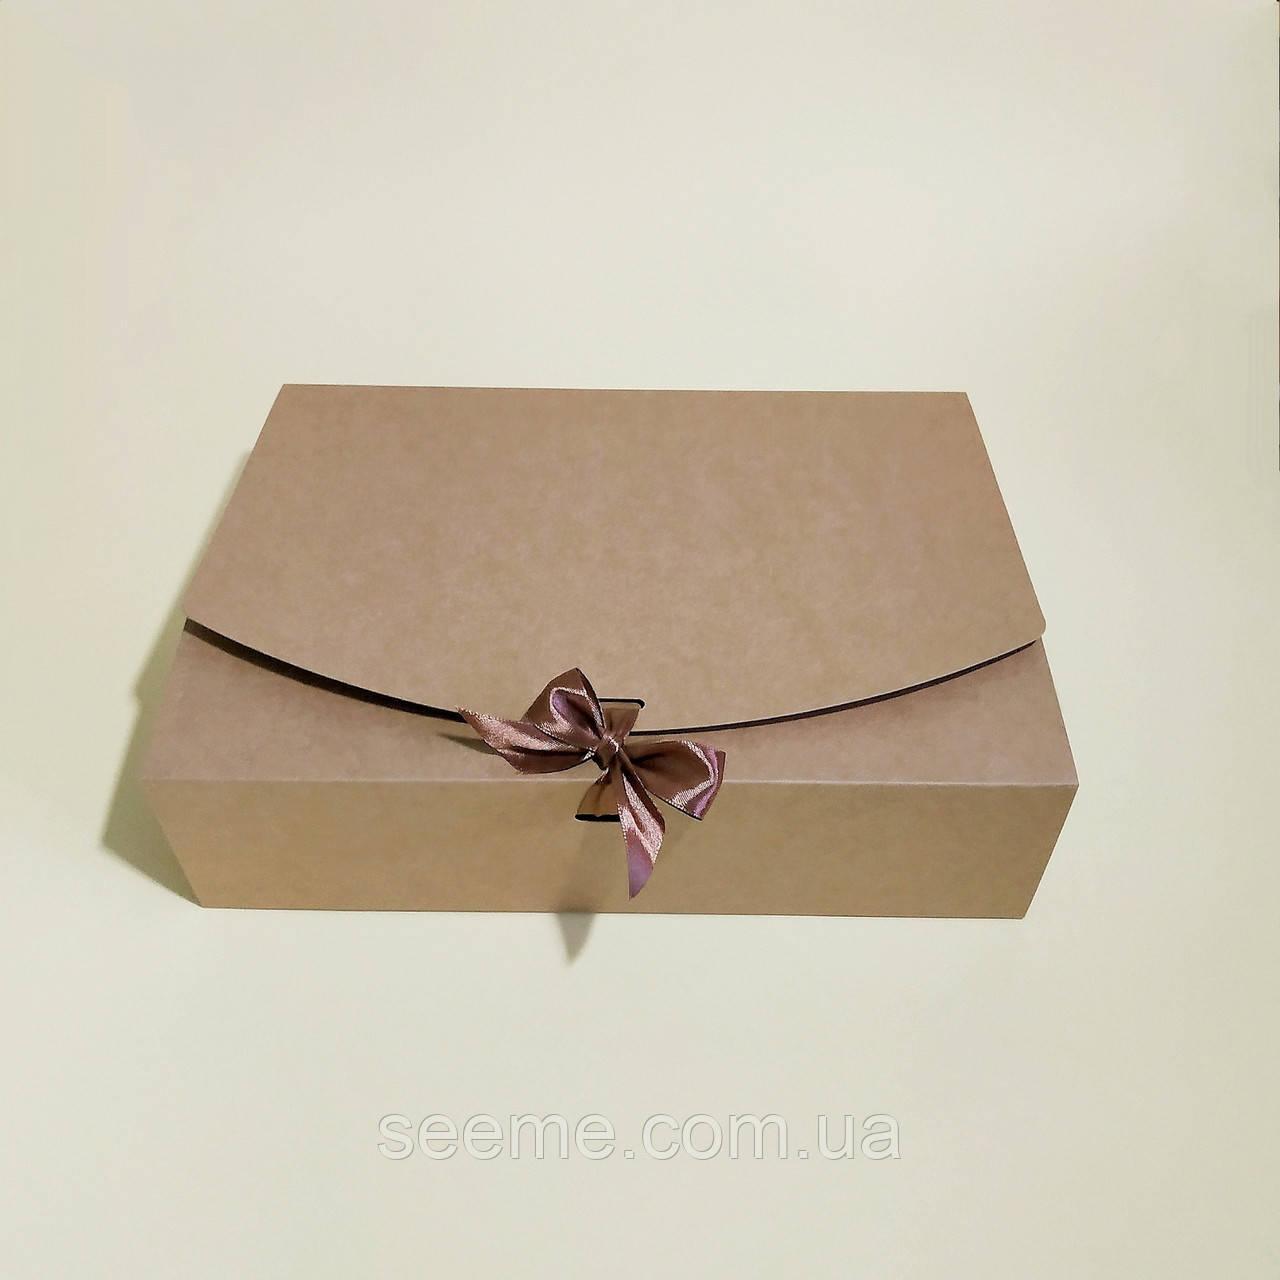 Коробка подарочная из крафт картона, 330х230х90 мм